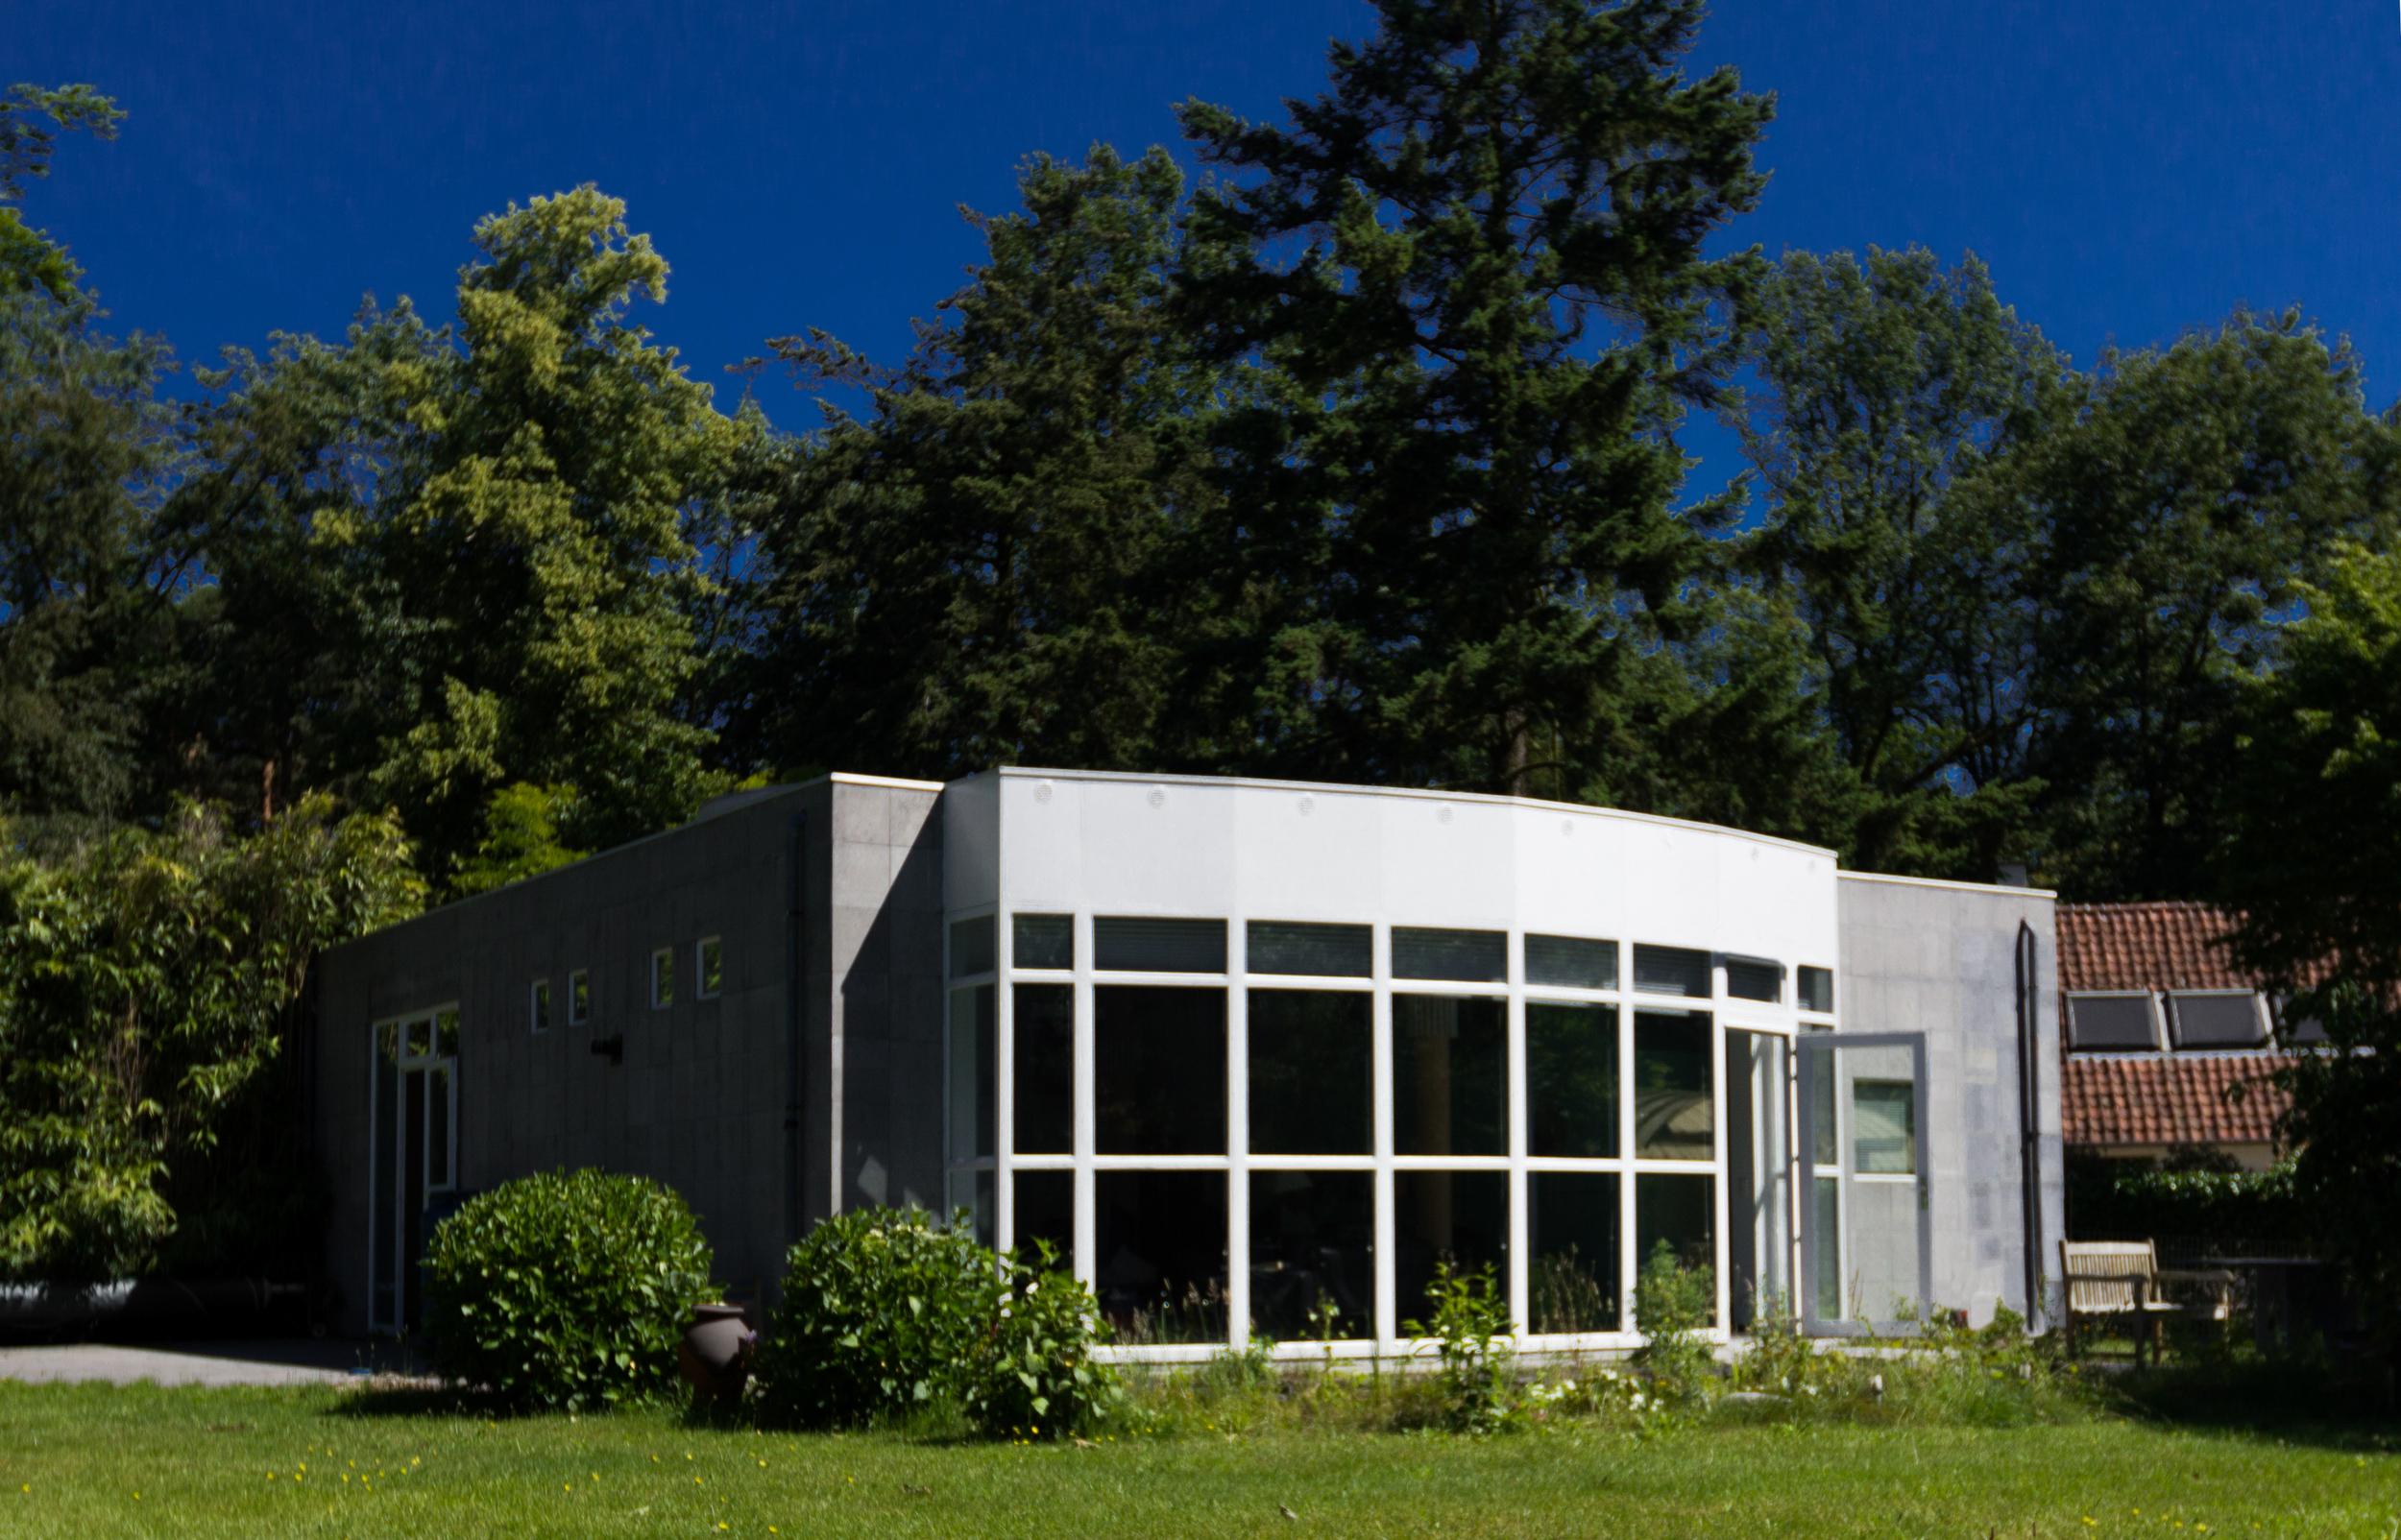 Woning R (c) architektenburo jef van oevelen-11.jpg